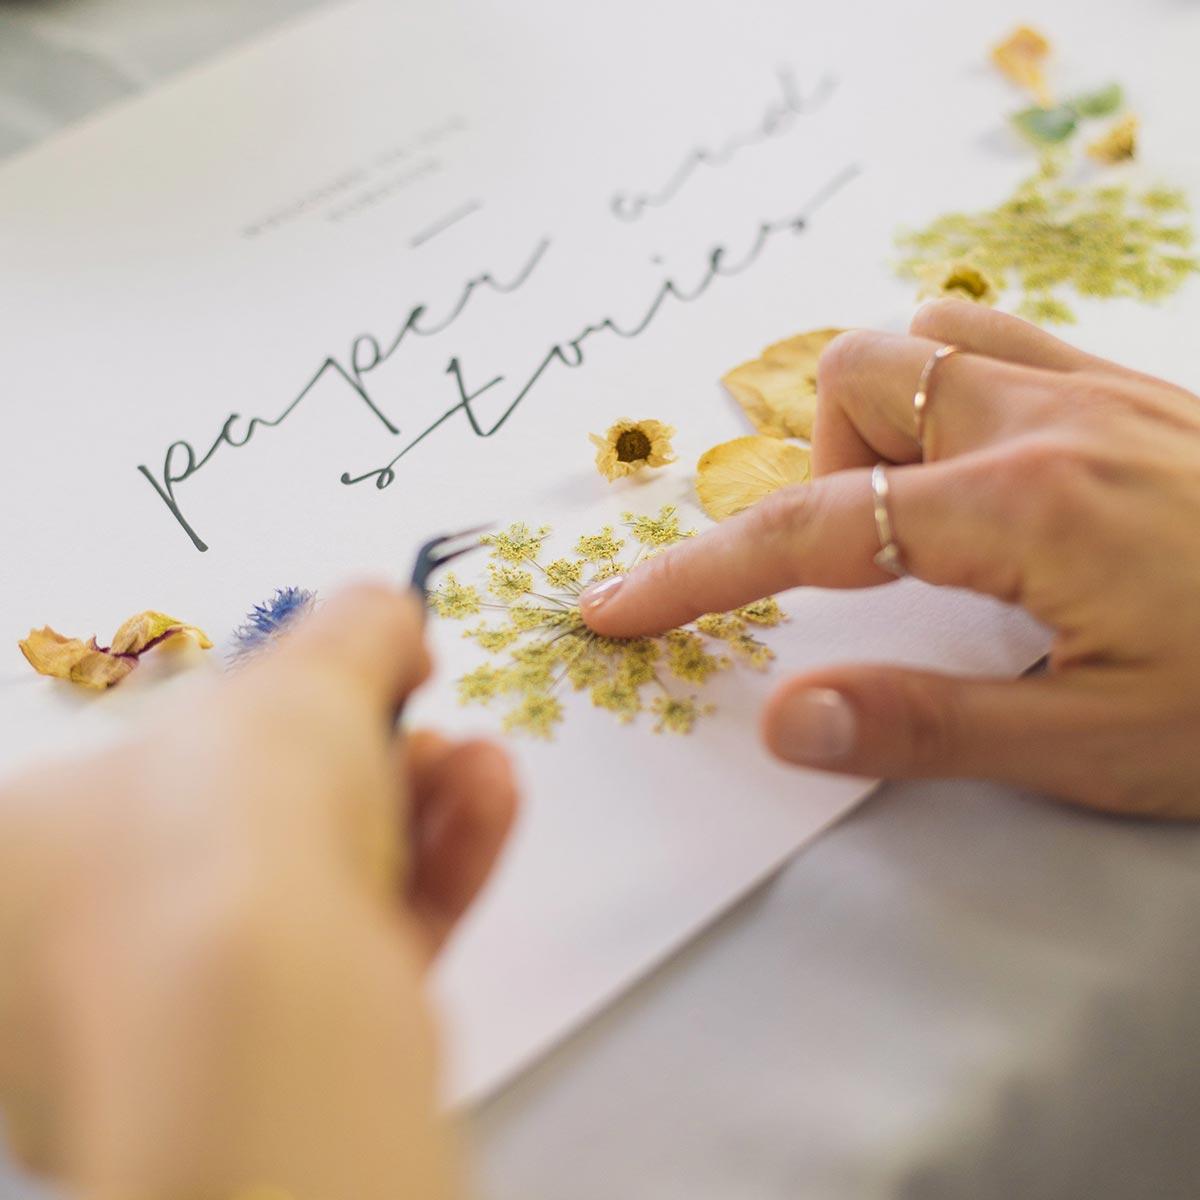 Partecipazioni Matrimonio Firenze.Papries Inviti Partecipazioni Matrimonio Primavera Firenze Wedding